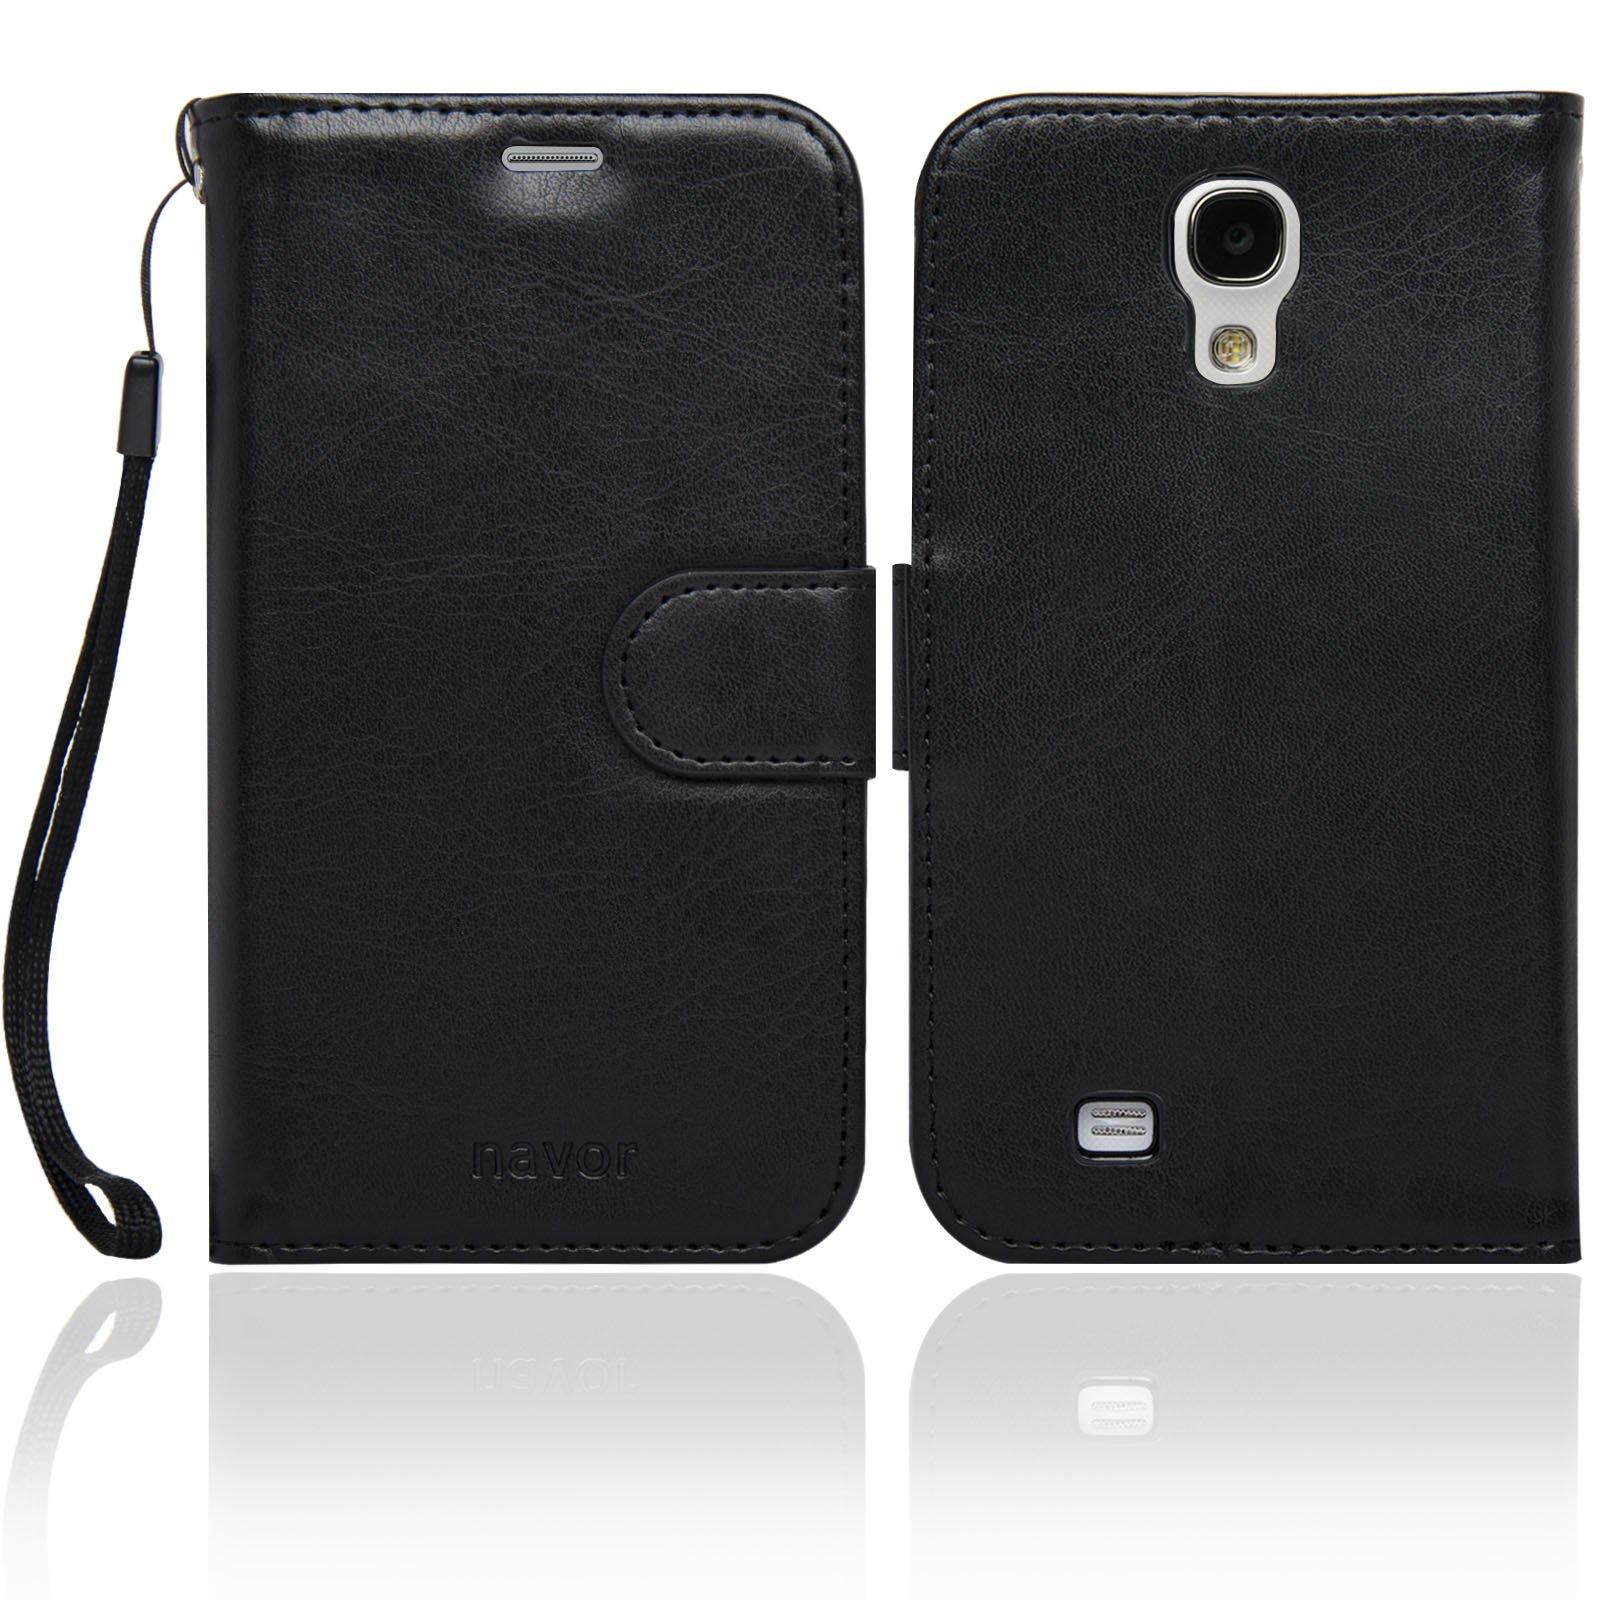 Navor Protective Flip Wallet Case for Samsung Galaxy S4 - Black (S4O-BK) by navor (Image #2)